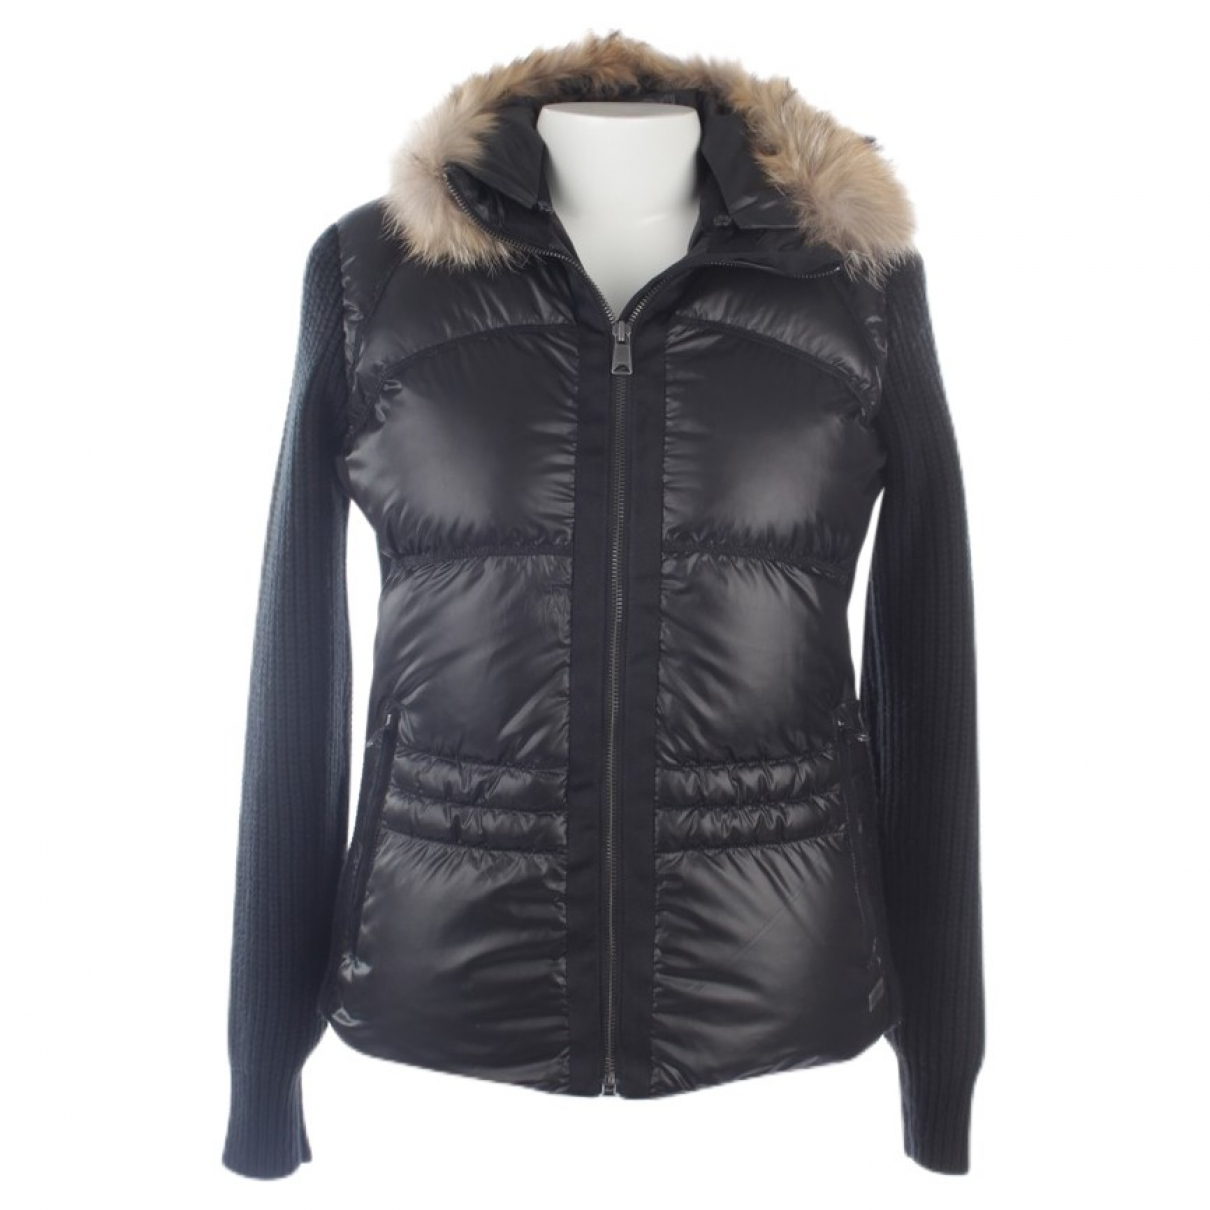 Napapijri \N Black jacket for Women S International